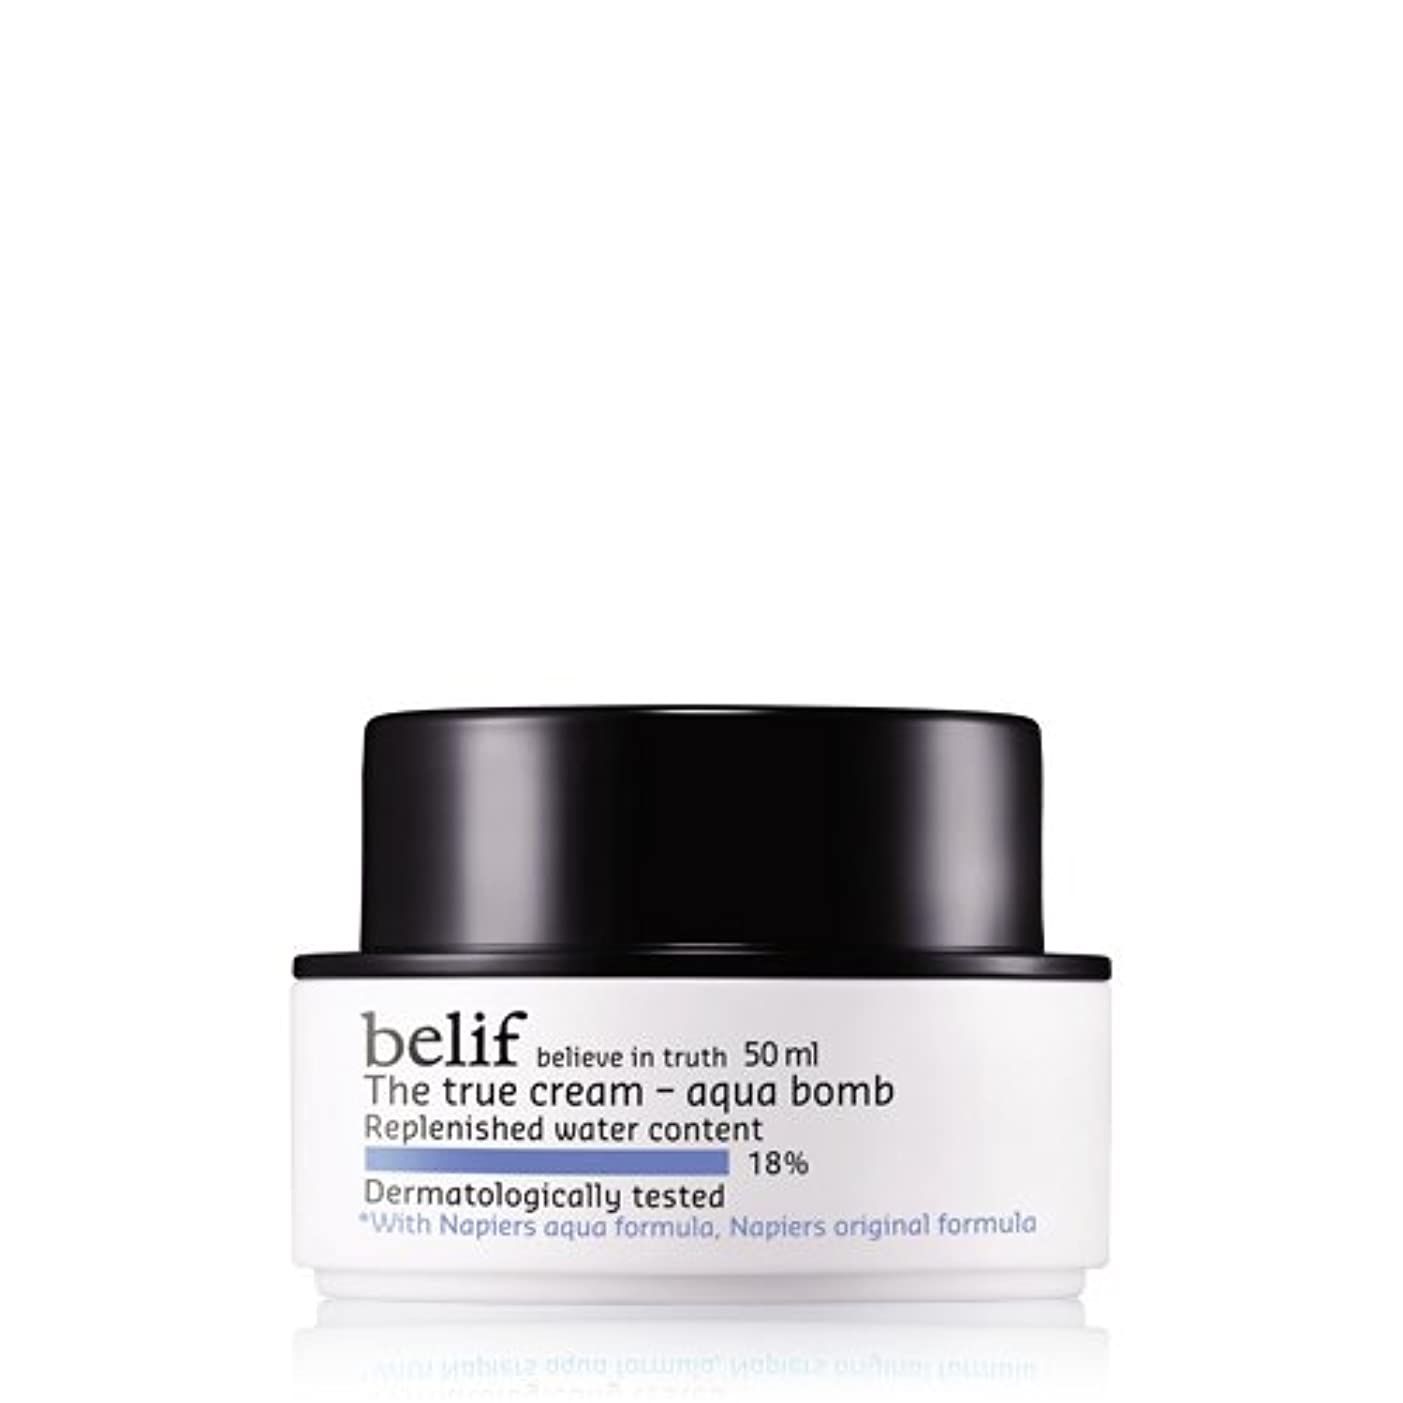 Belif(ビリーフ) The true cream-aqua bomb 50ml/ザトゥルークリームアクアバーム/ビリーフ水分爆弾ジェルタイプクリーム/さわやかな使用感//オーガニックコスメ